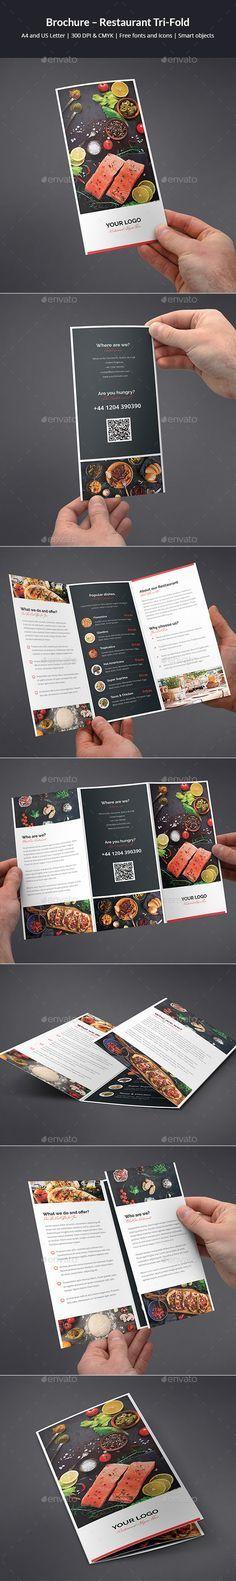 Brochure Restaurant Tri Fold Tri Fold Brochure Template Tri